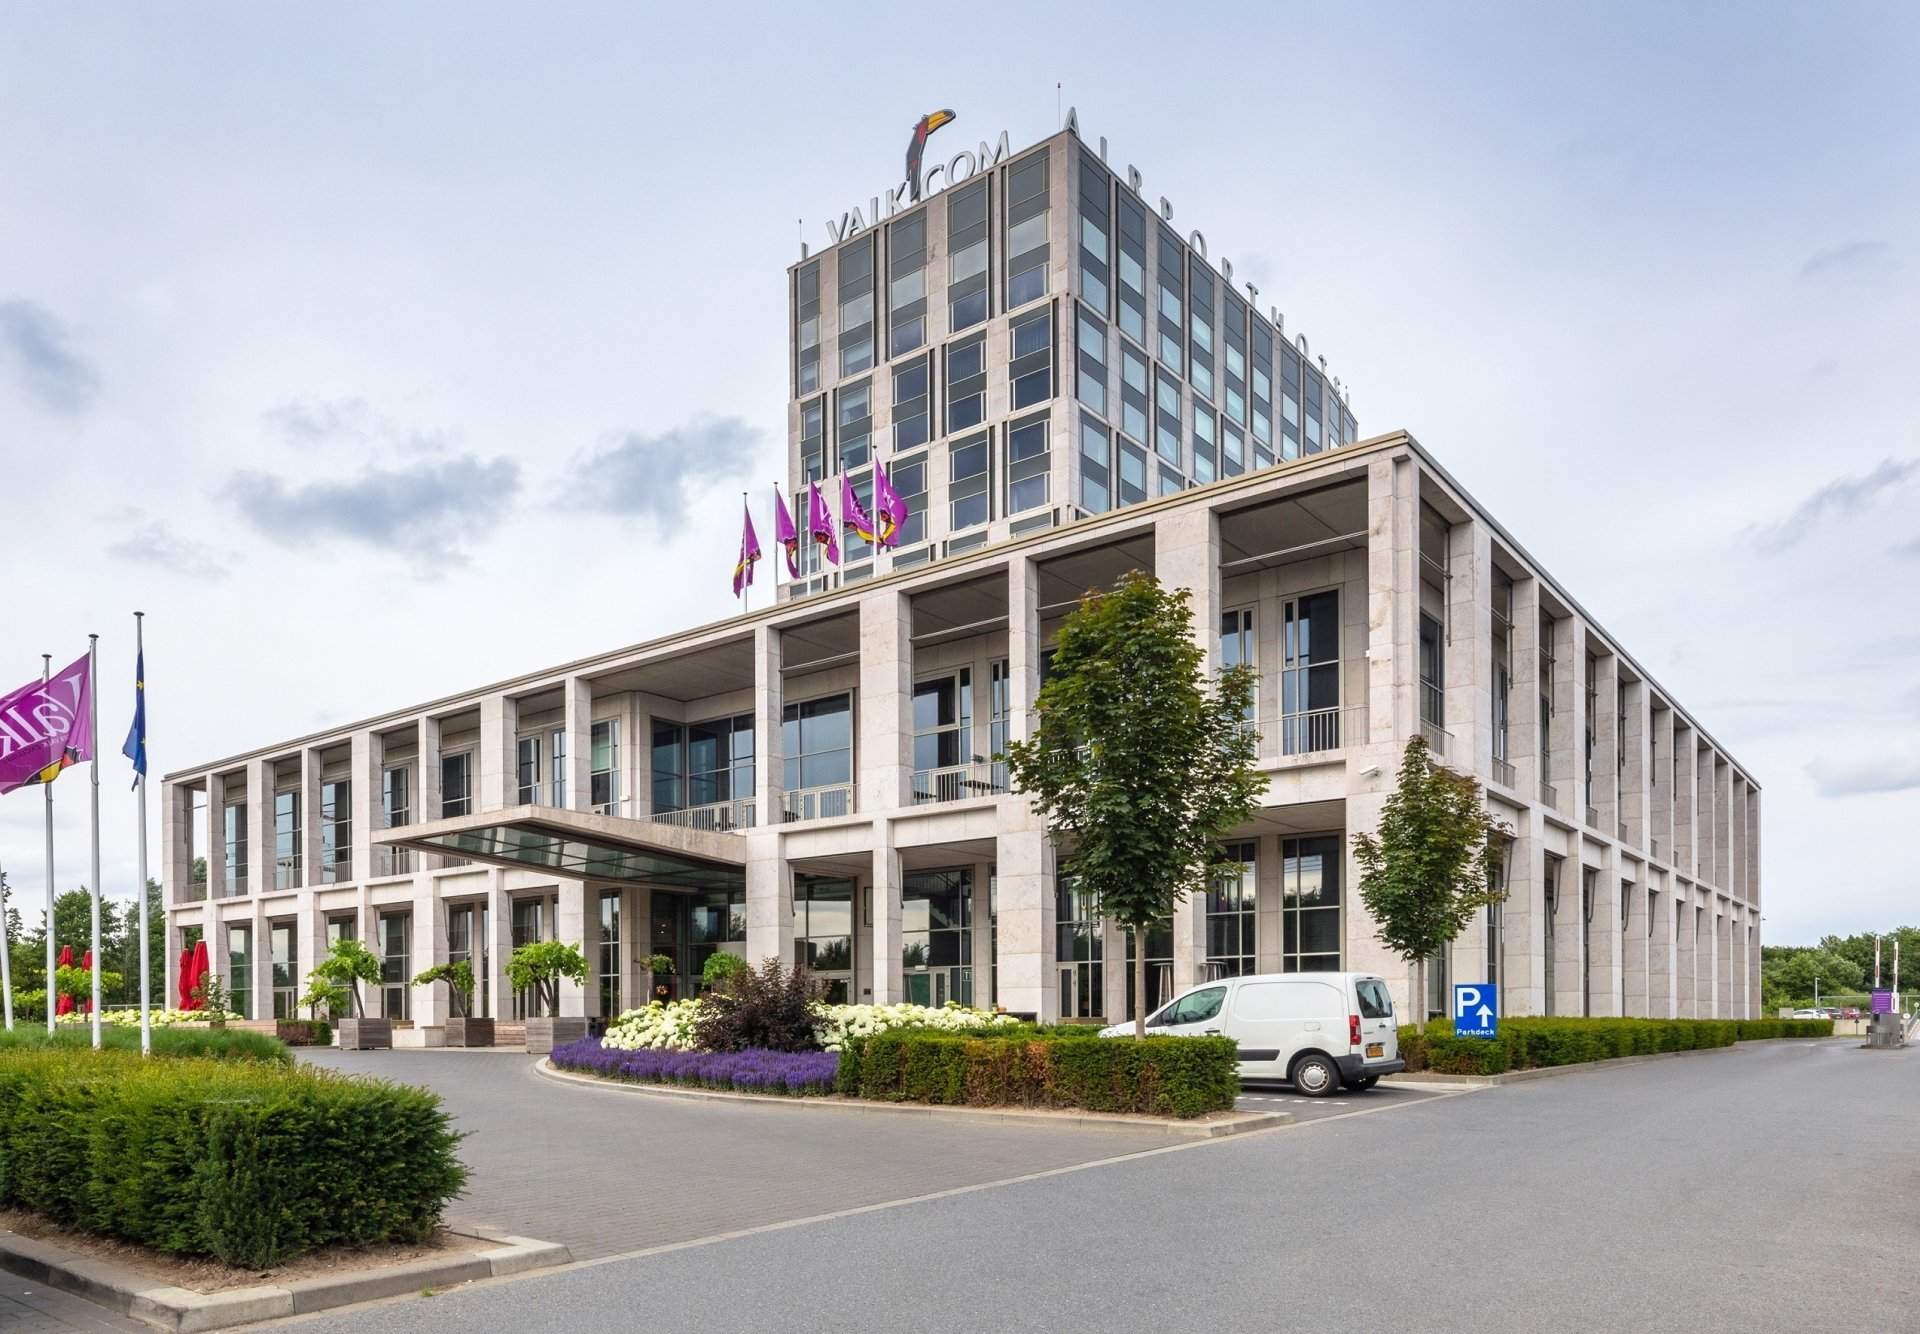 Mini Kühlschrank Düsseldorf : Hotel van der valk airporthotel düsseldorf in düsseldorf